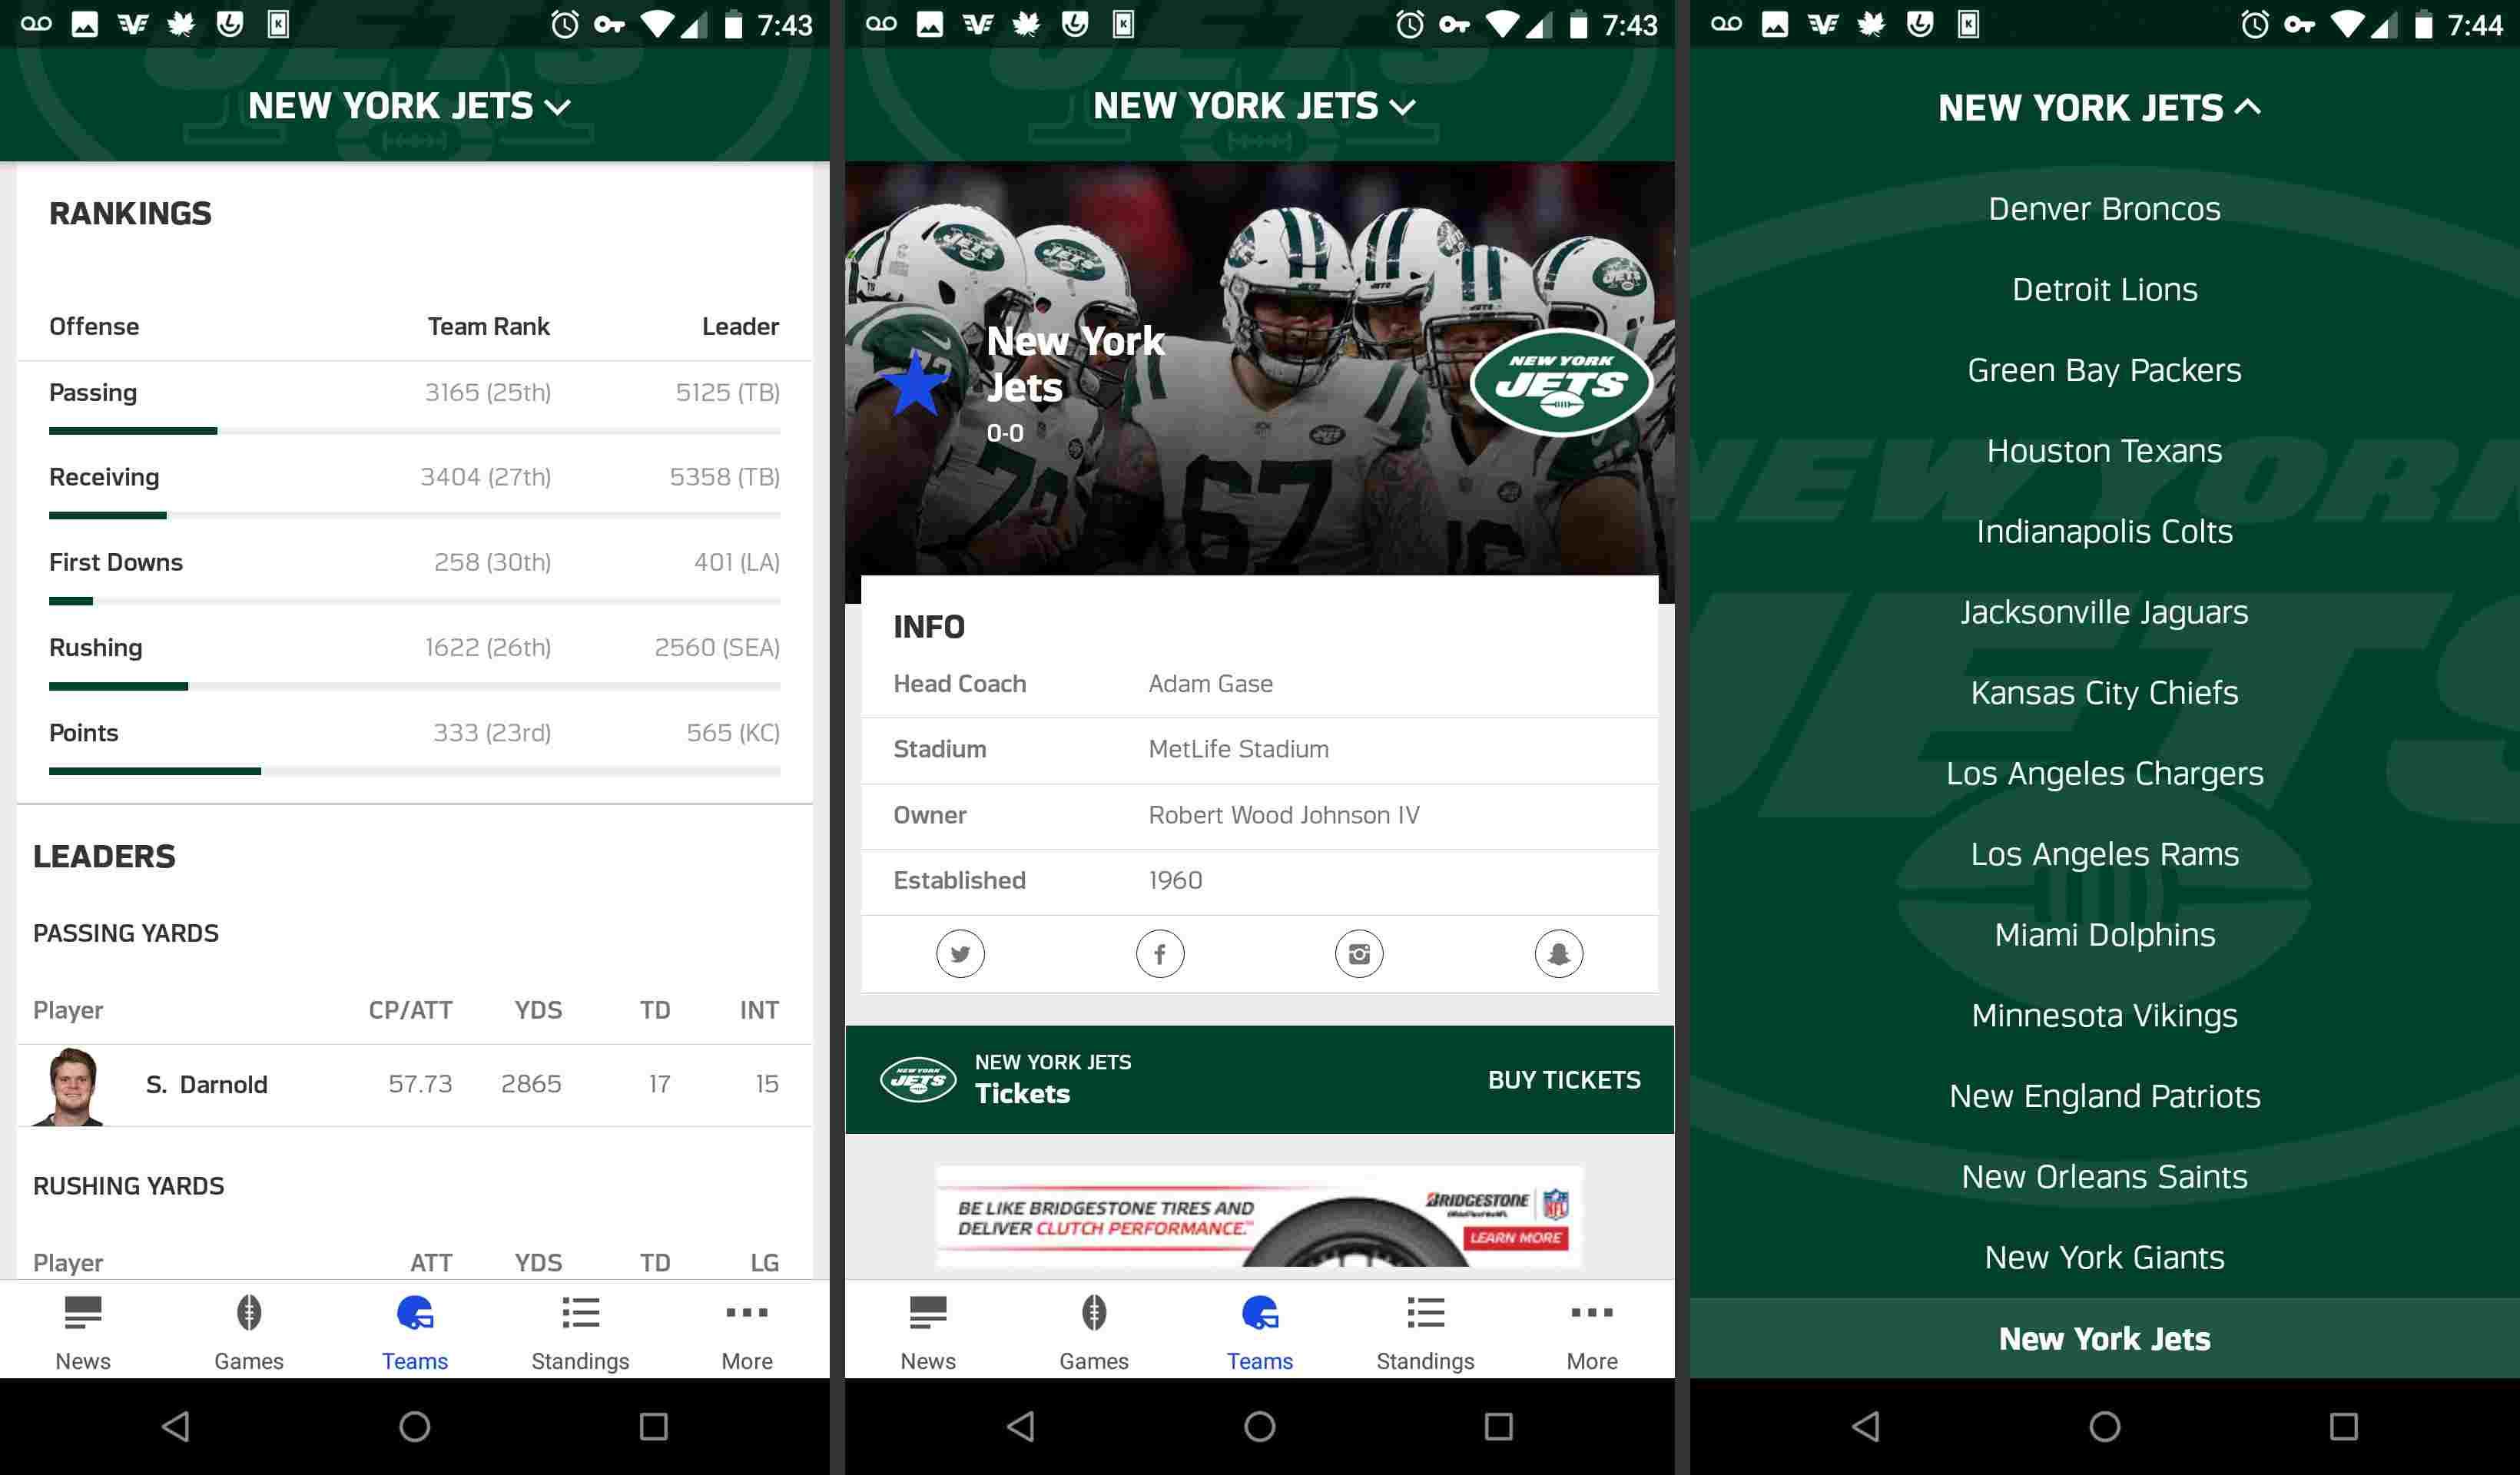 NFL mobile app teams pages